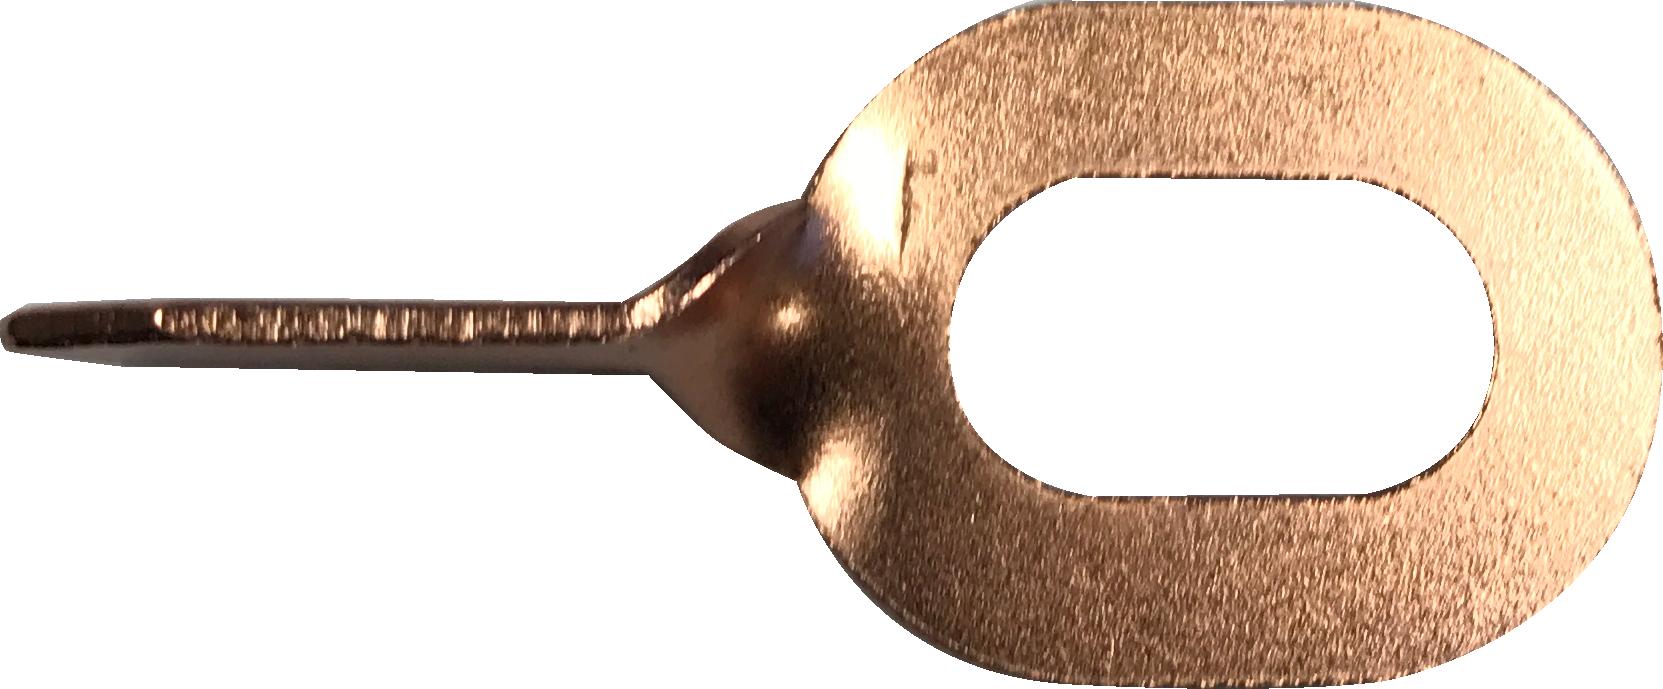 Twisted Weld Key